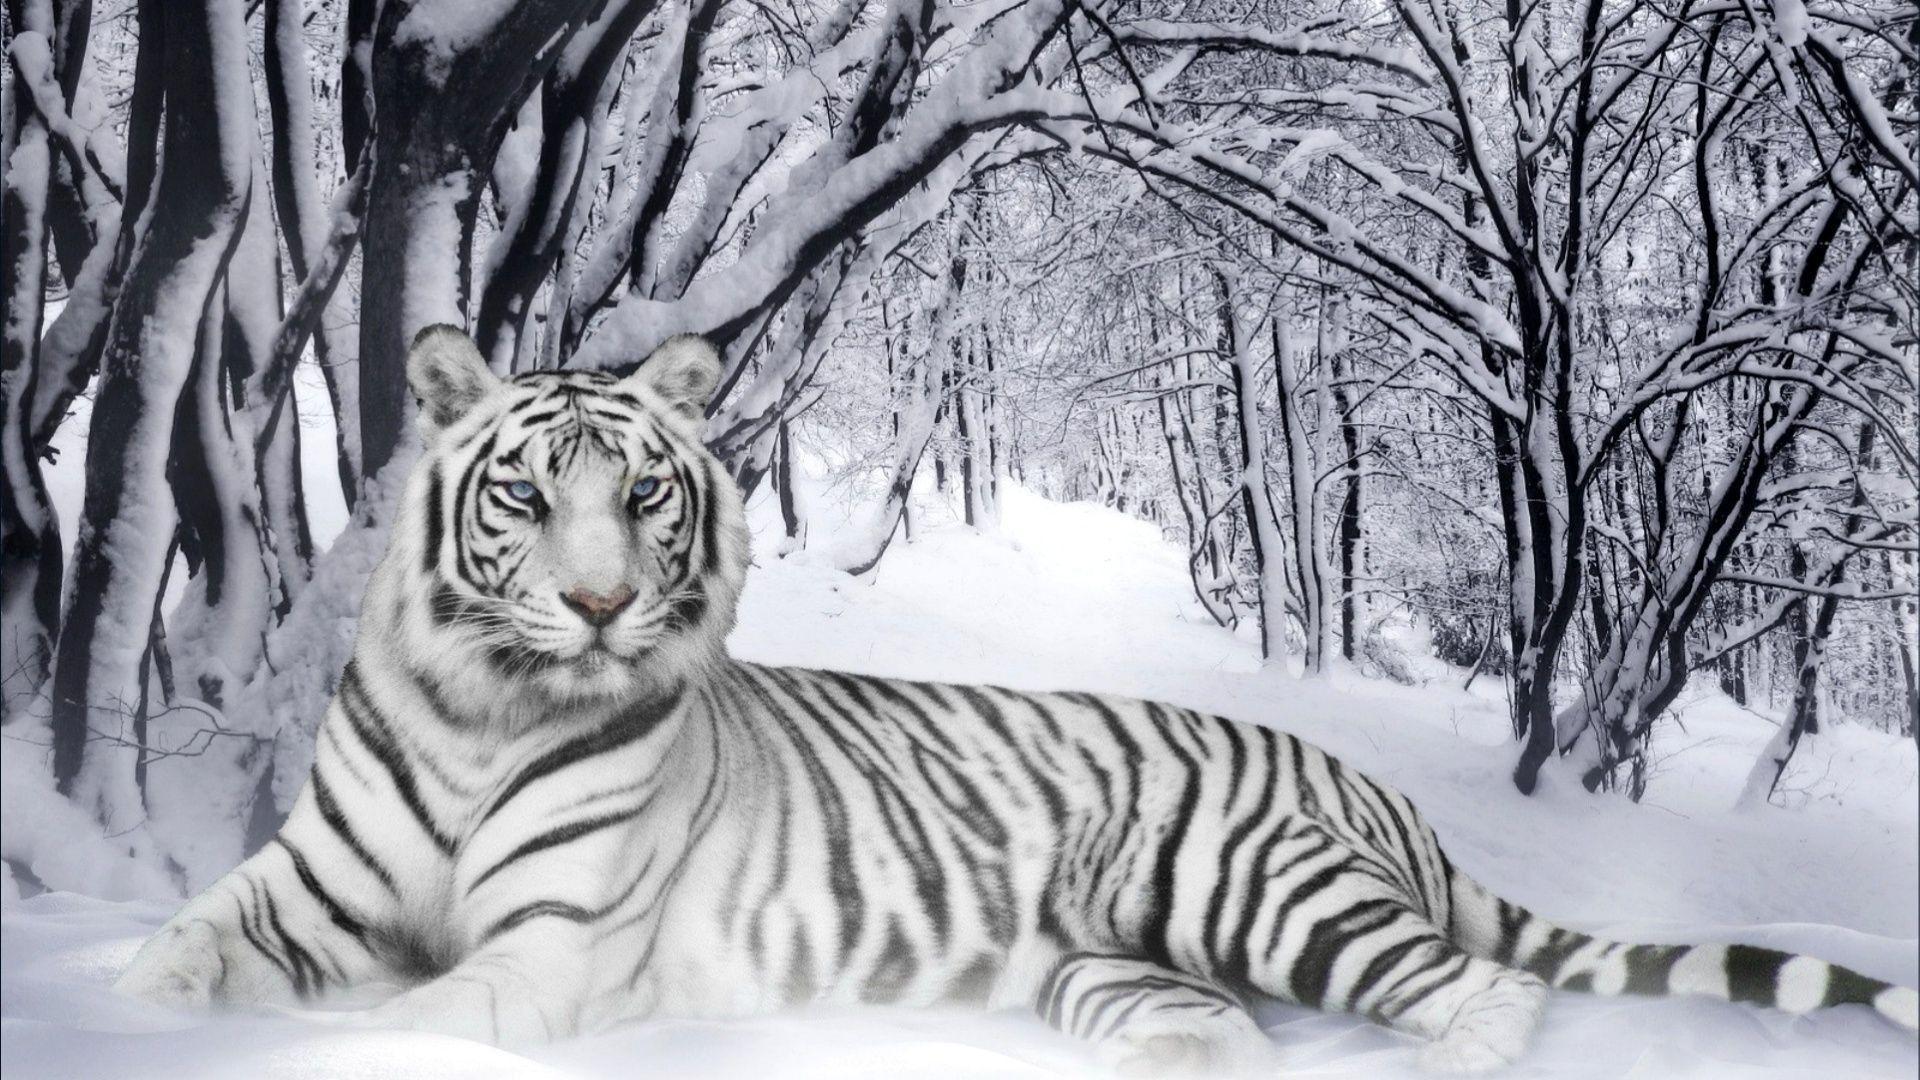 Tiger Hd Desktop Free Wallpaper Download Tiger Desktop Themes